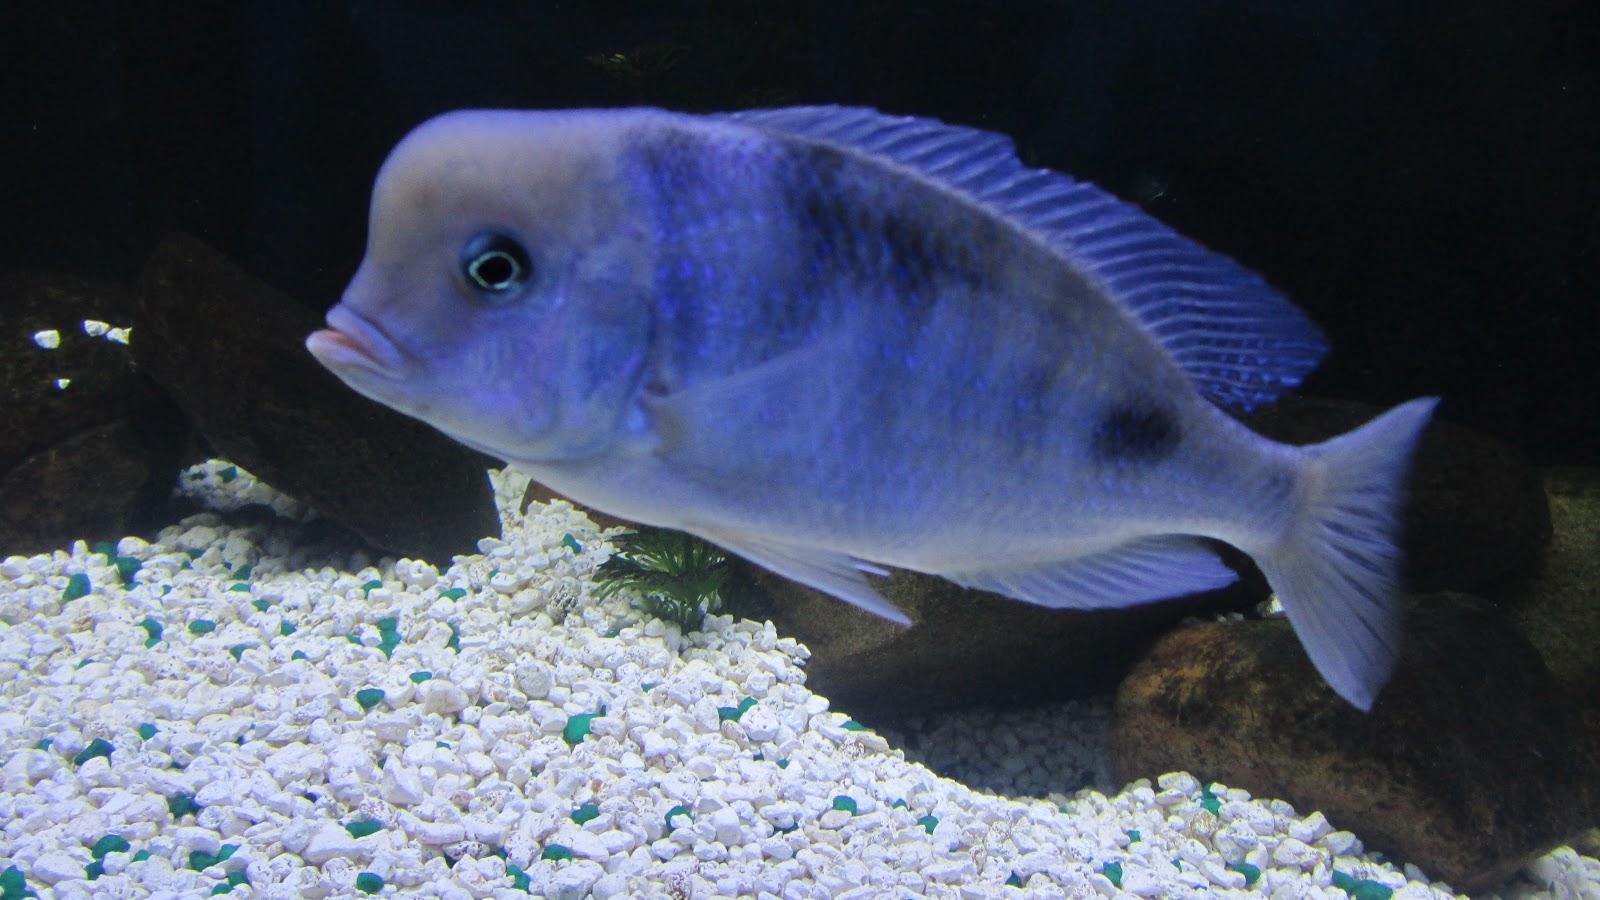 mal/tang fish: Cyrtocara moorii Blue Dolphin, 7-6-12